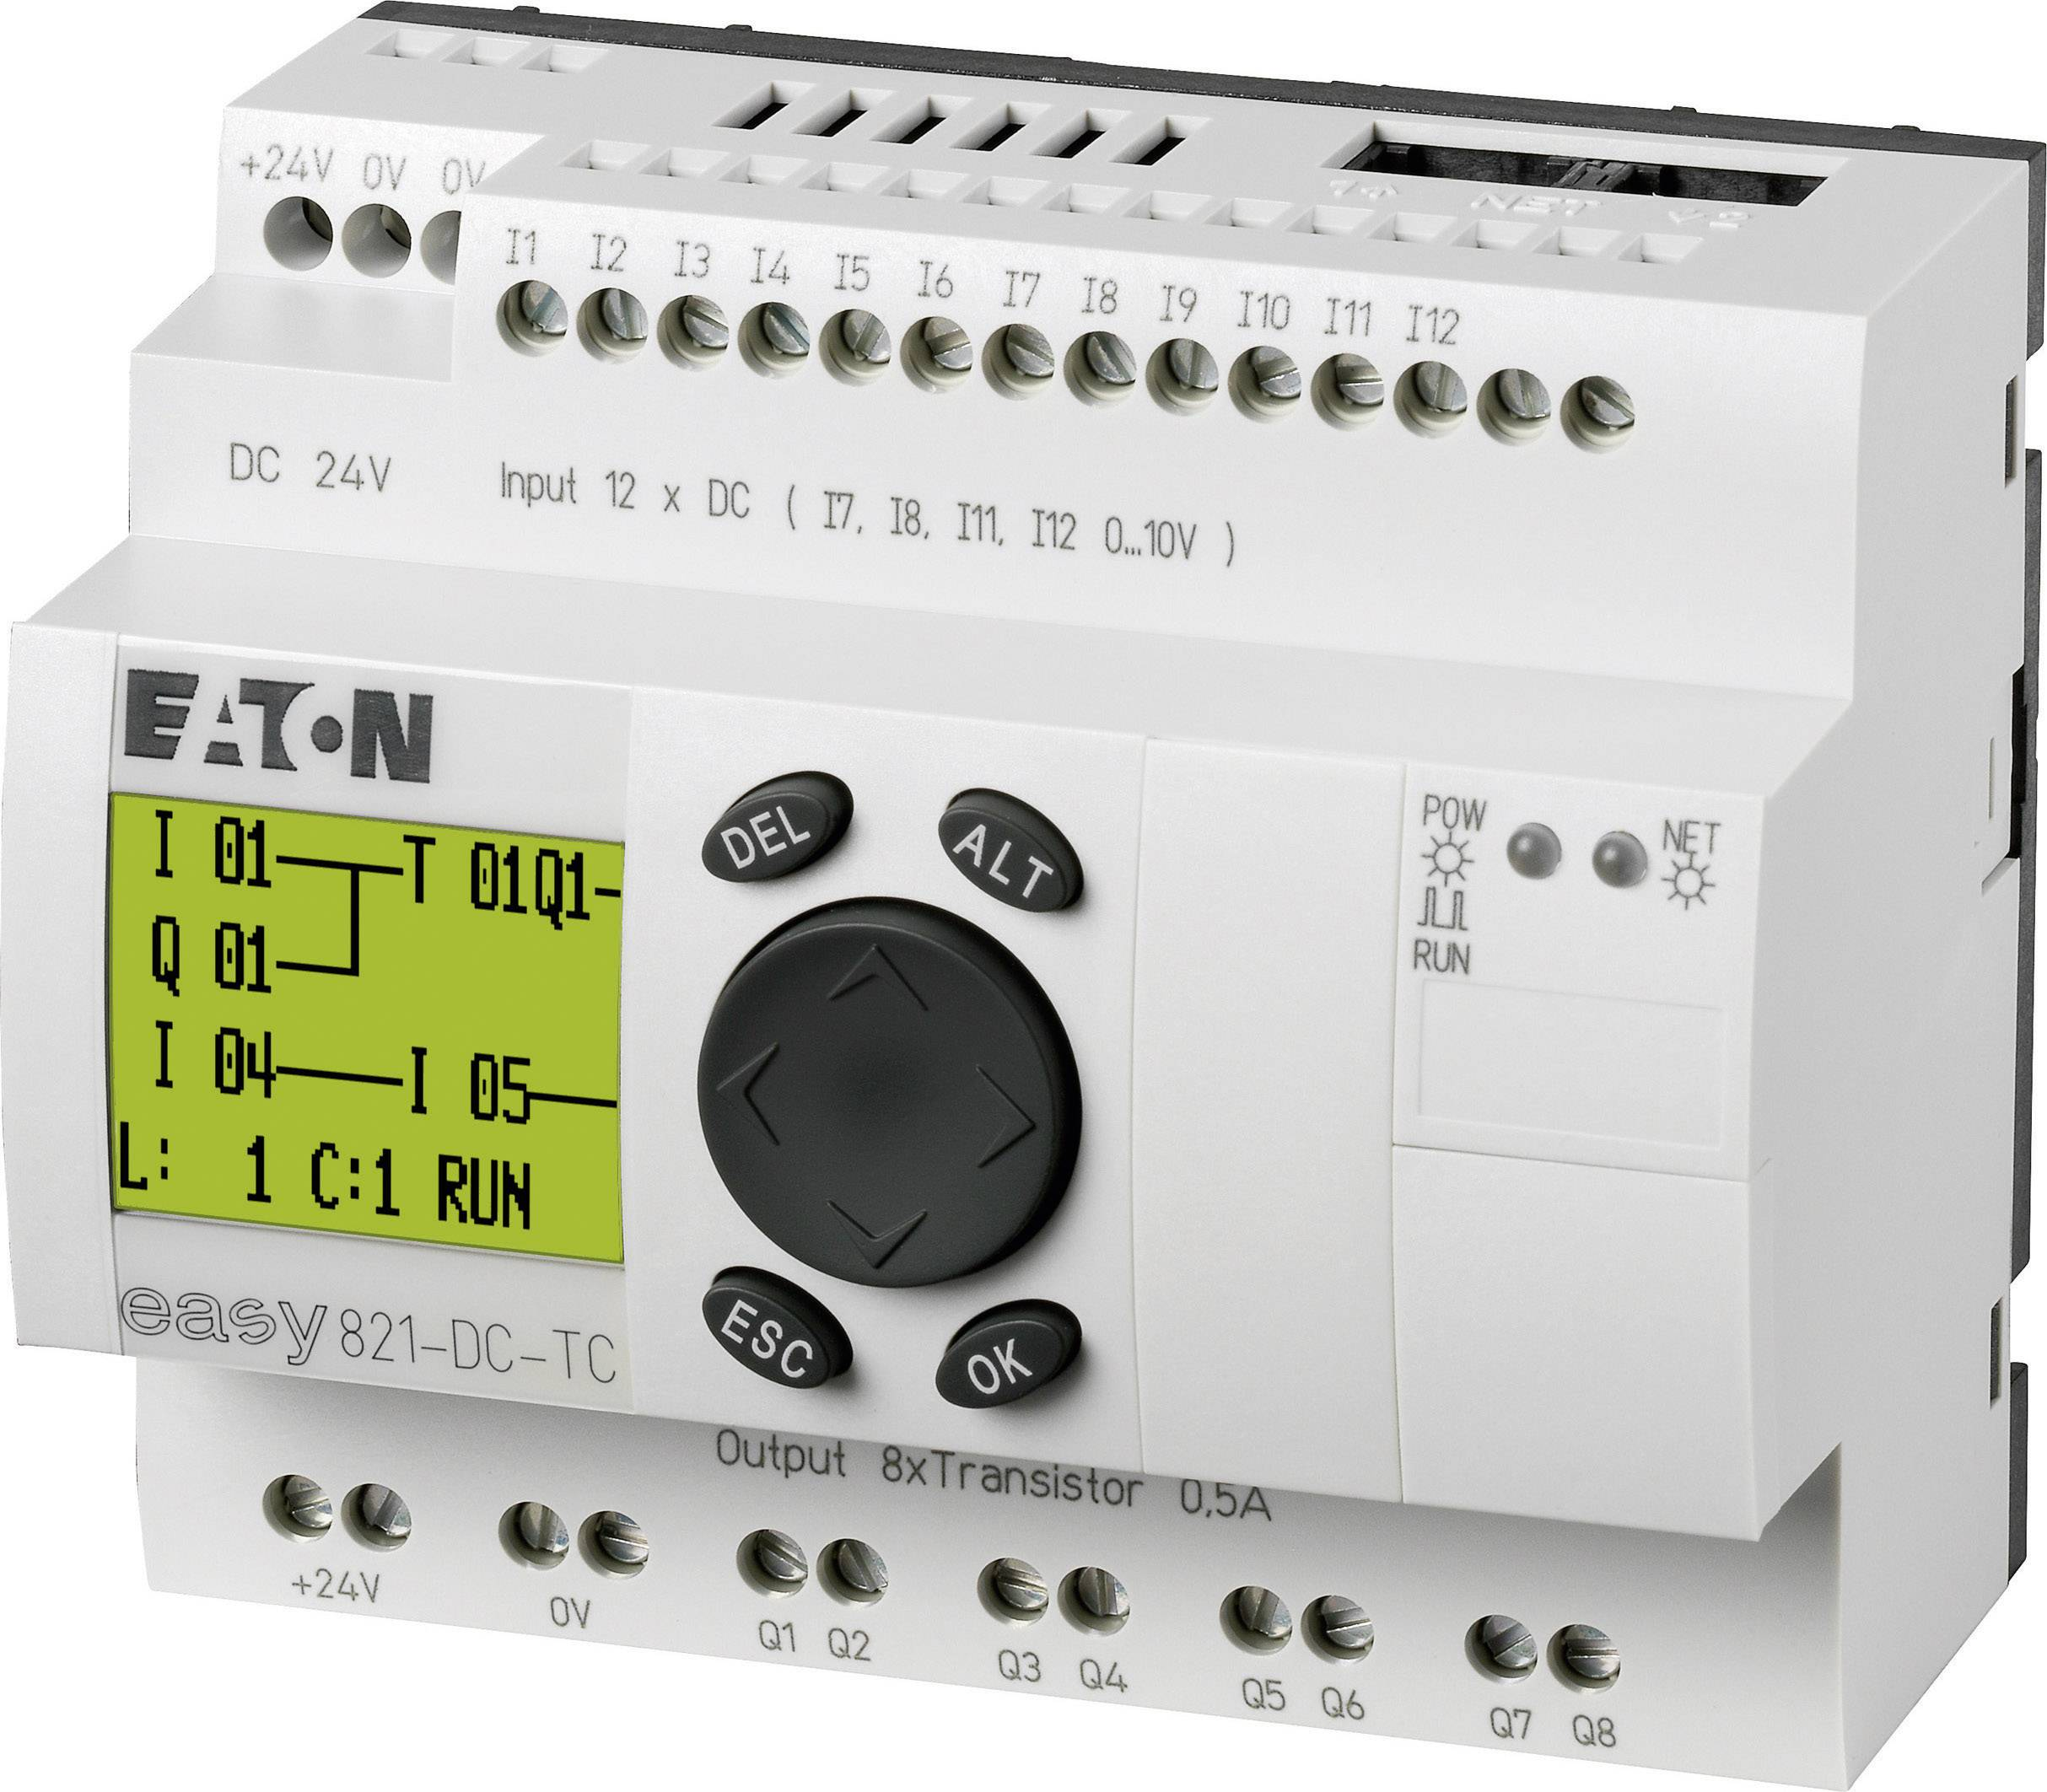 Řídicí reléový modul Eaton easy 821-DC-TC (256273), IP20, 12, 8x tranzistor